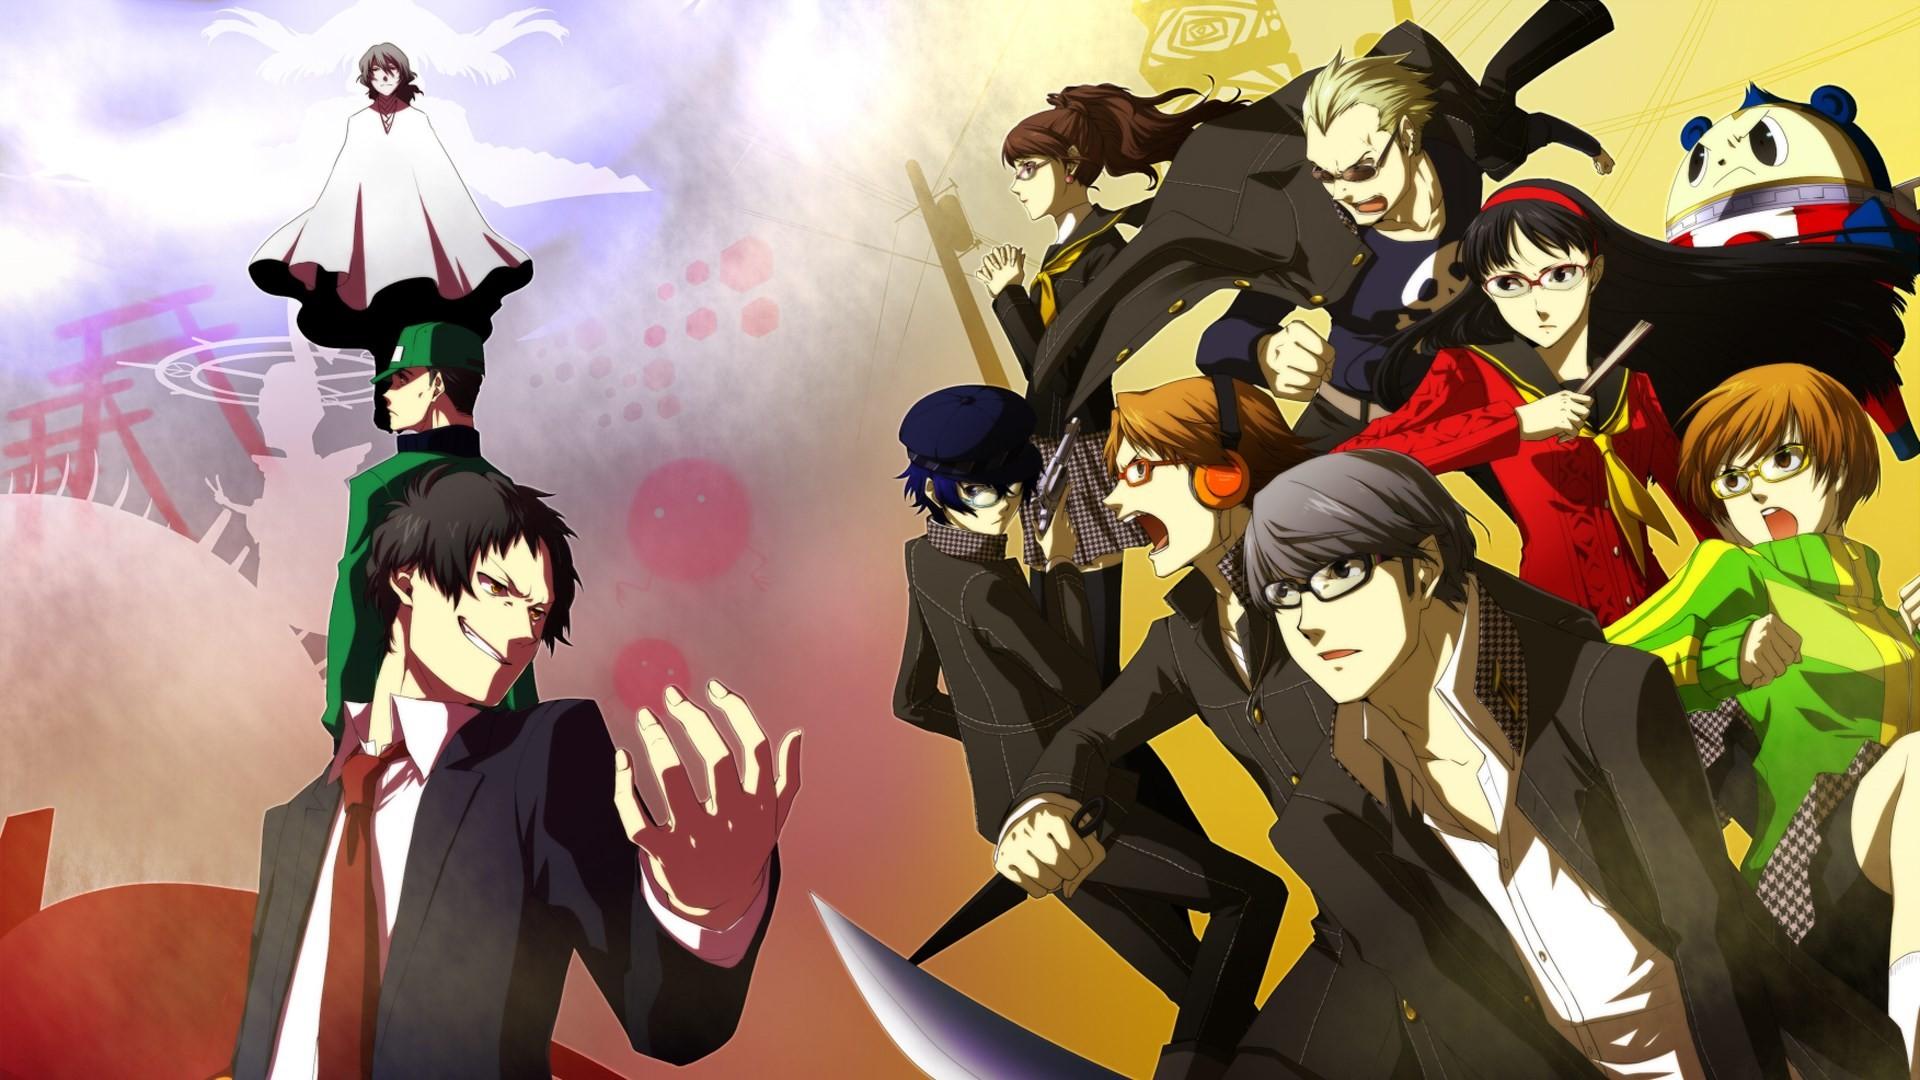 The 25+ best Persona 4 wallpaper ideas on Pinterest   Persona 3 anime, Shin  megami tensei 3 and Persona 4